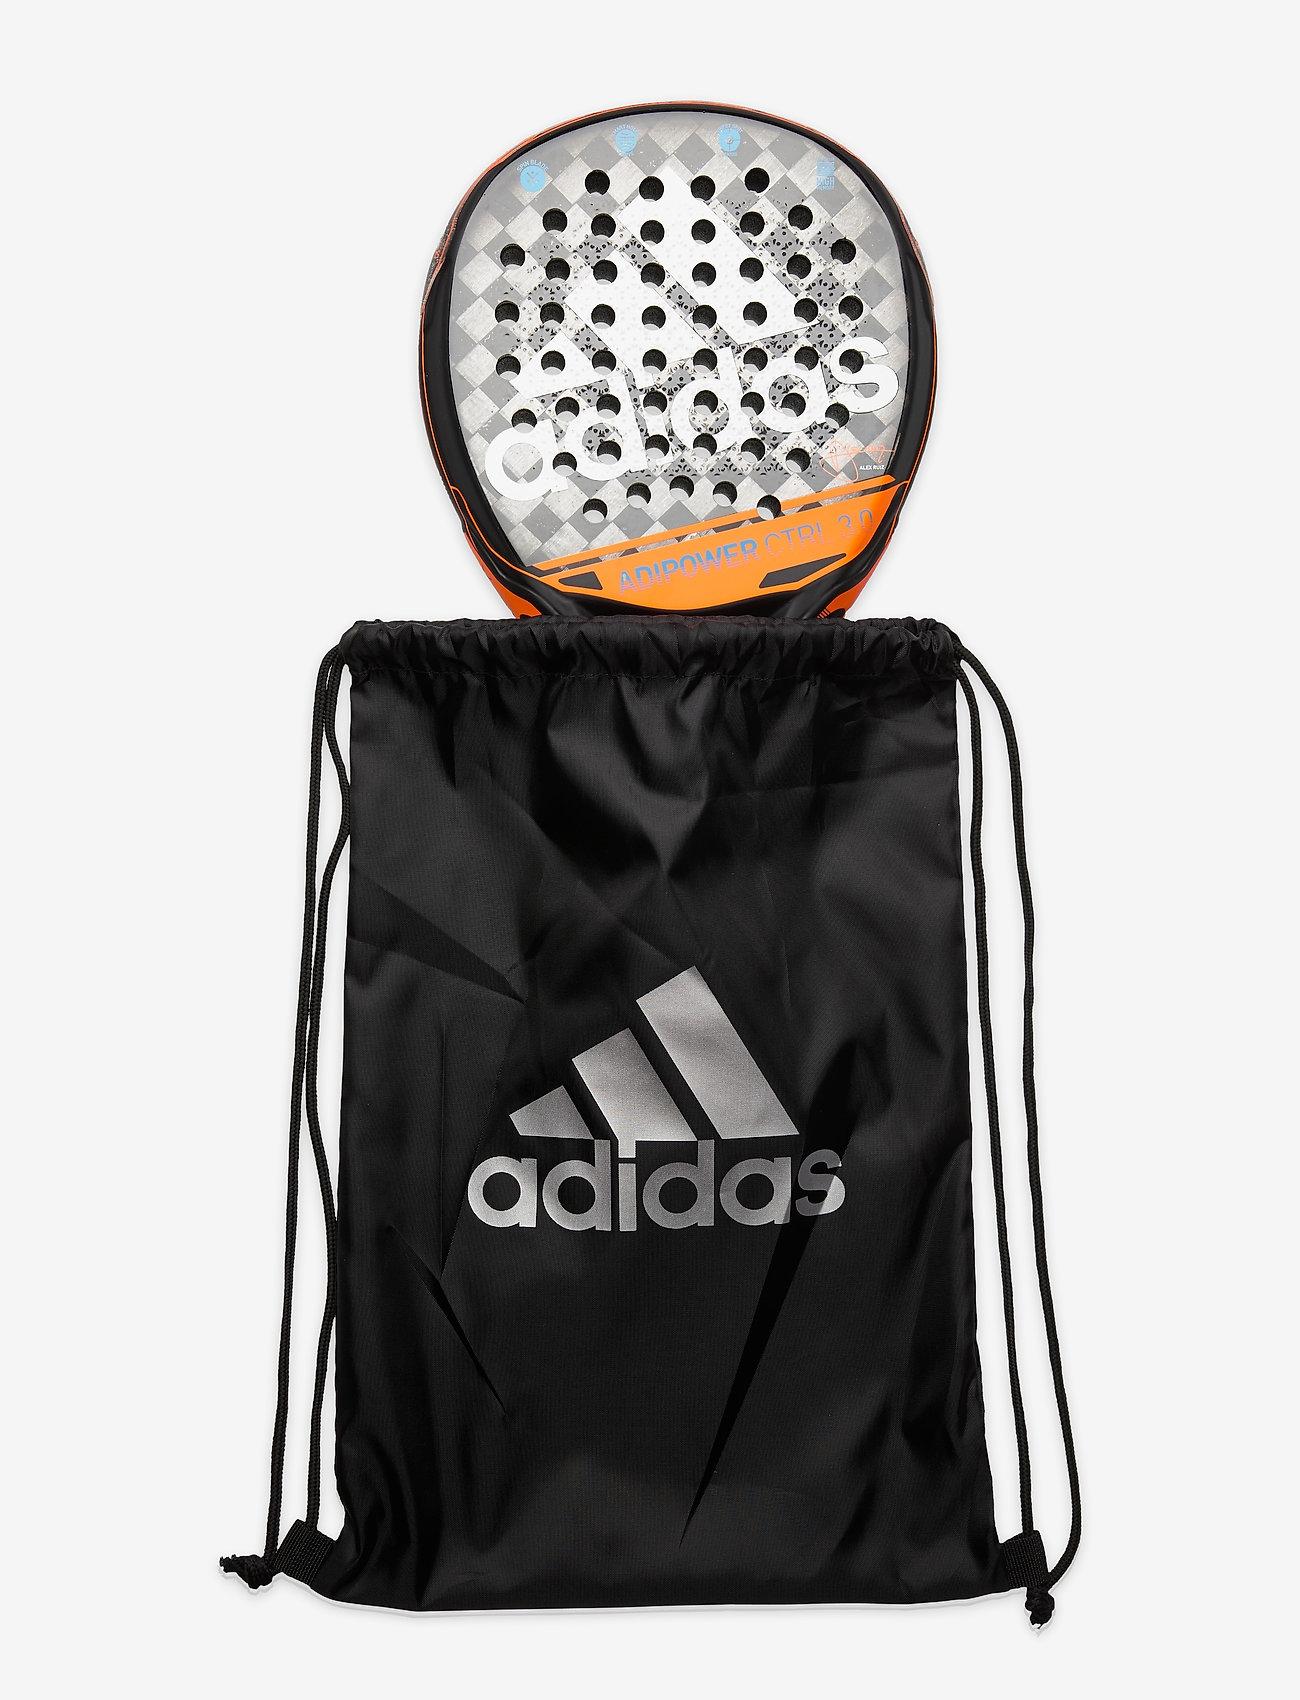 adidas Performance - adipower CTRL 3.0 - padelschläger - orange - 1